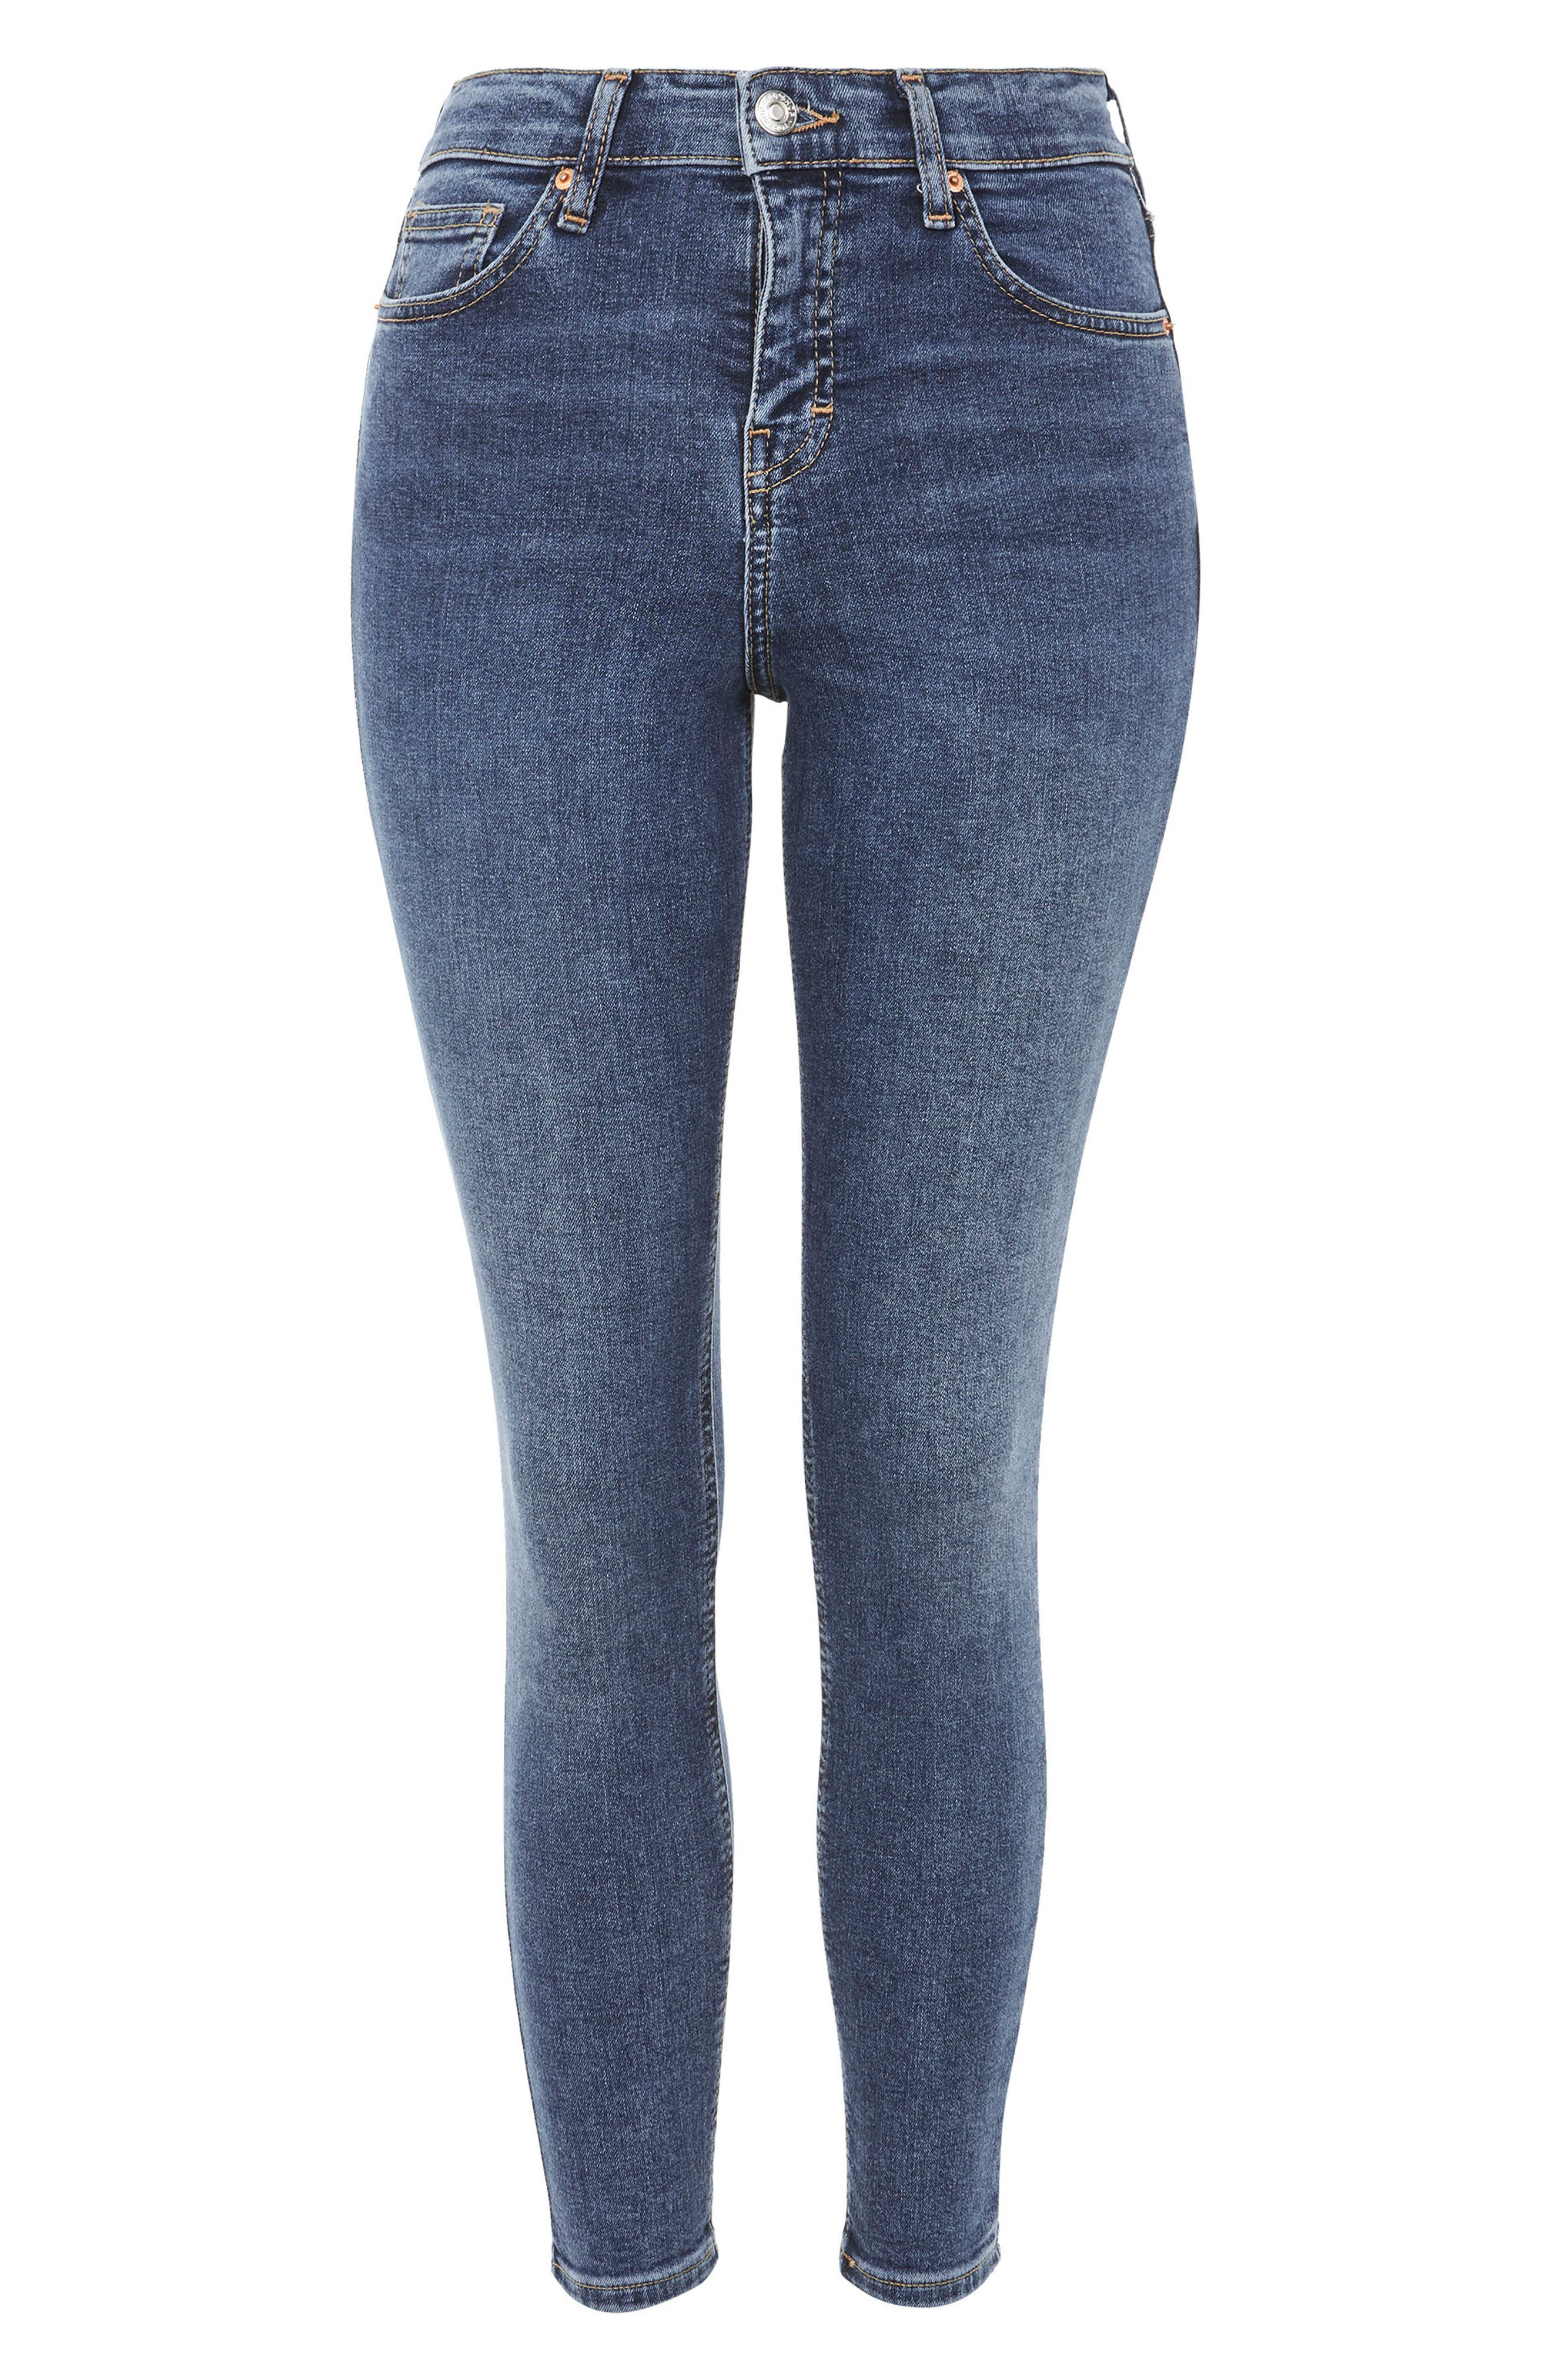 Jamie Petite Jeans,                             Alternate thumbnail 3, color,                             INDIGO